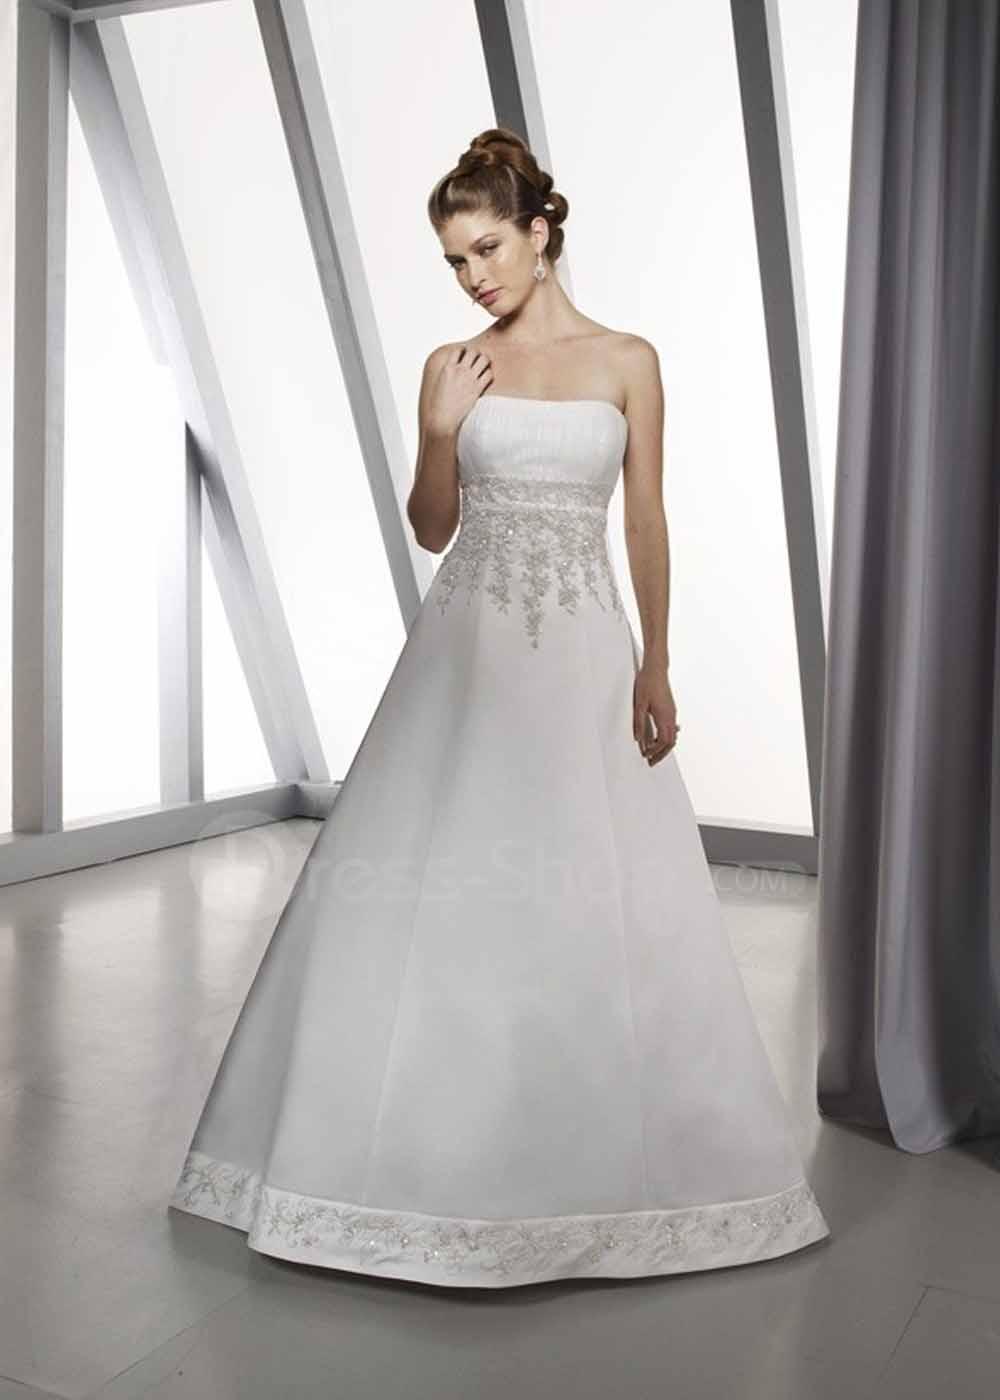 wedding dress for fair skin tone empire wedding dresses Gown